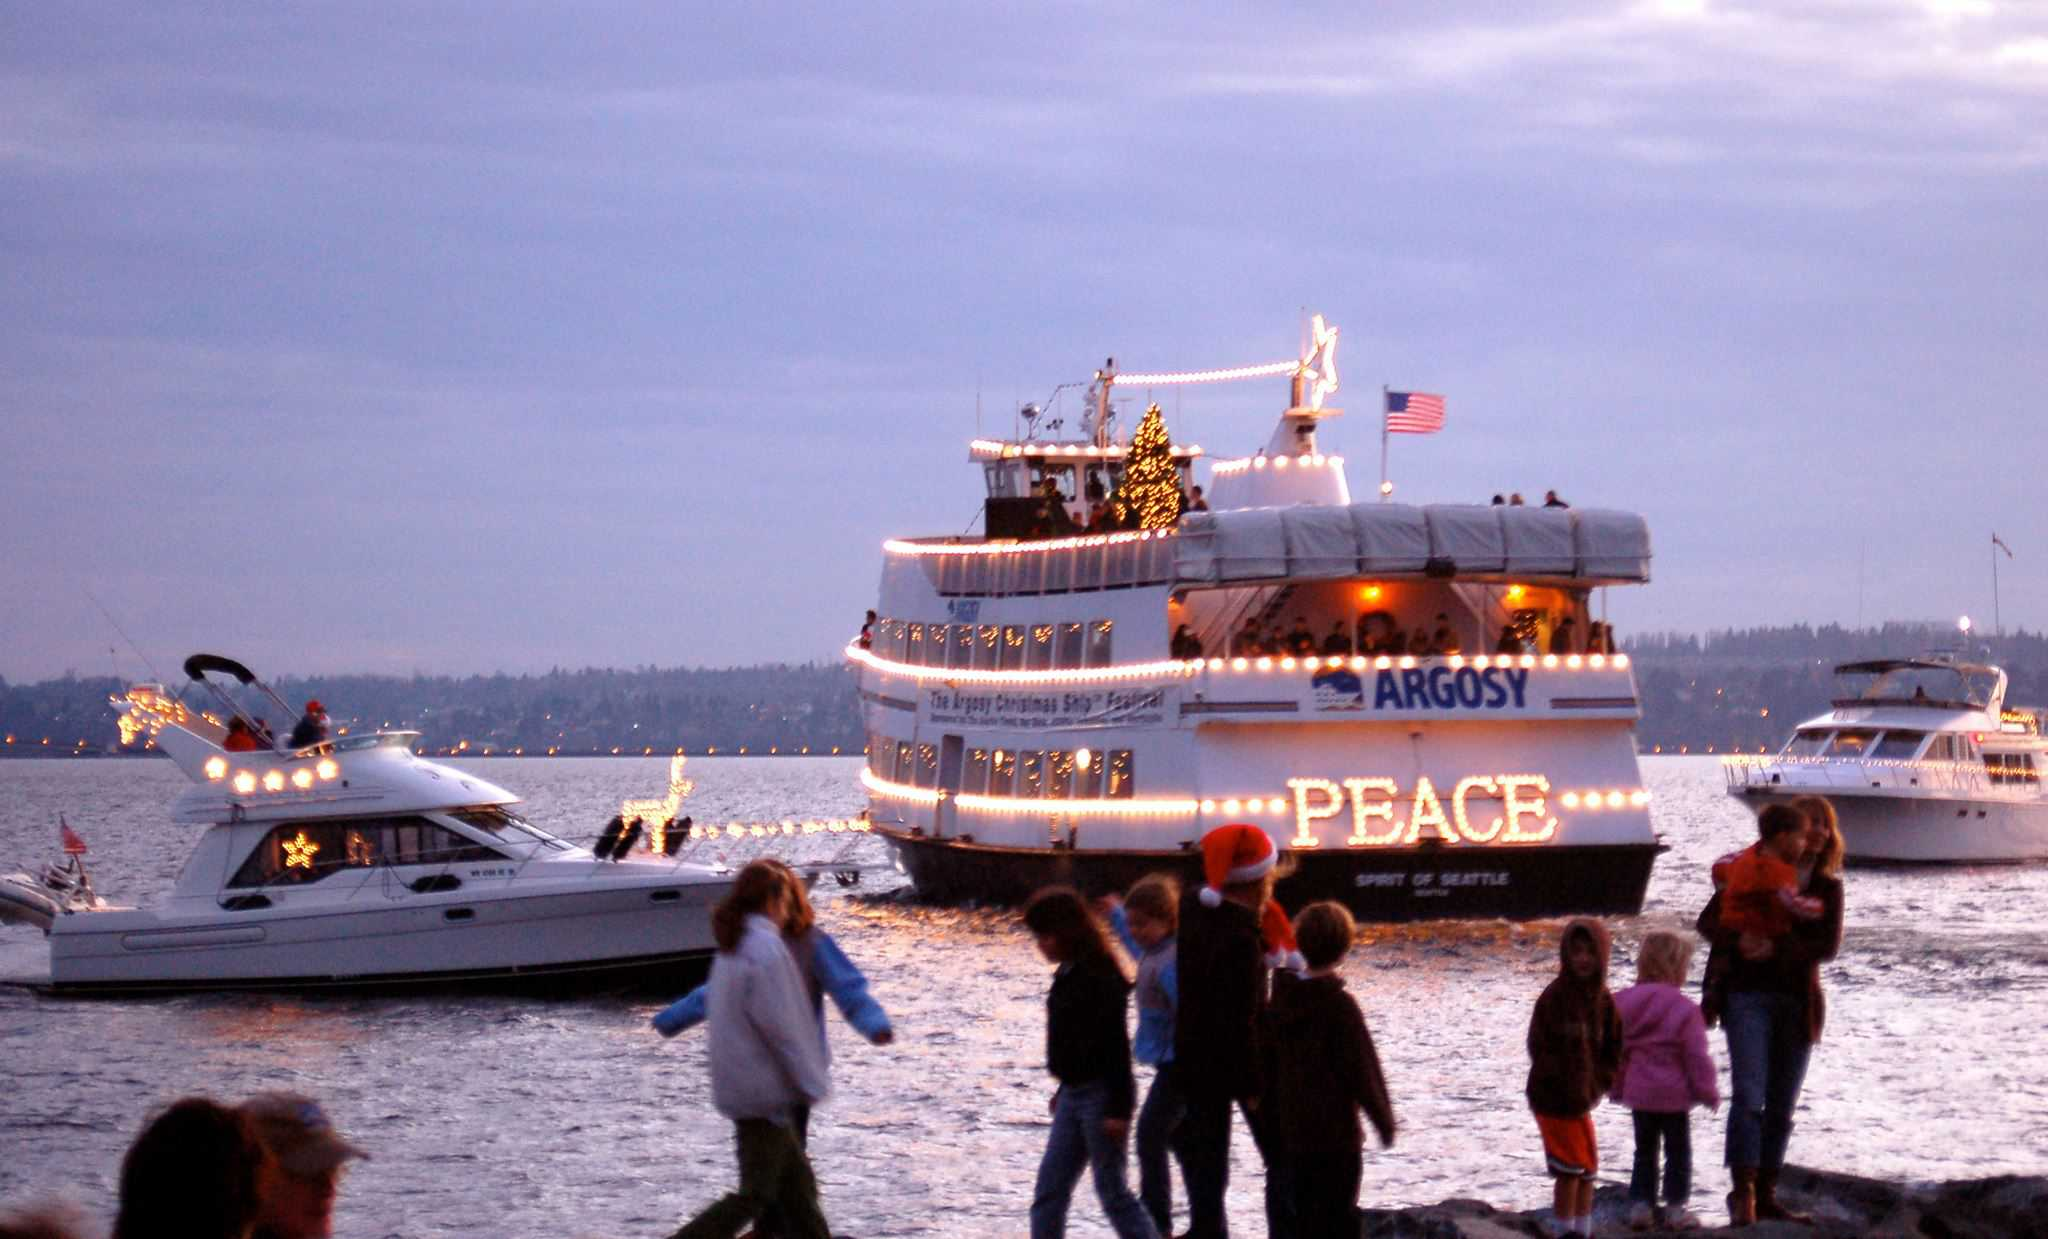 Argosy Cruises Christmas Ship